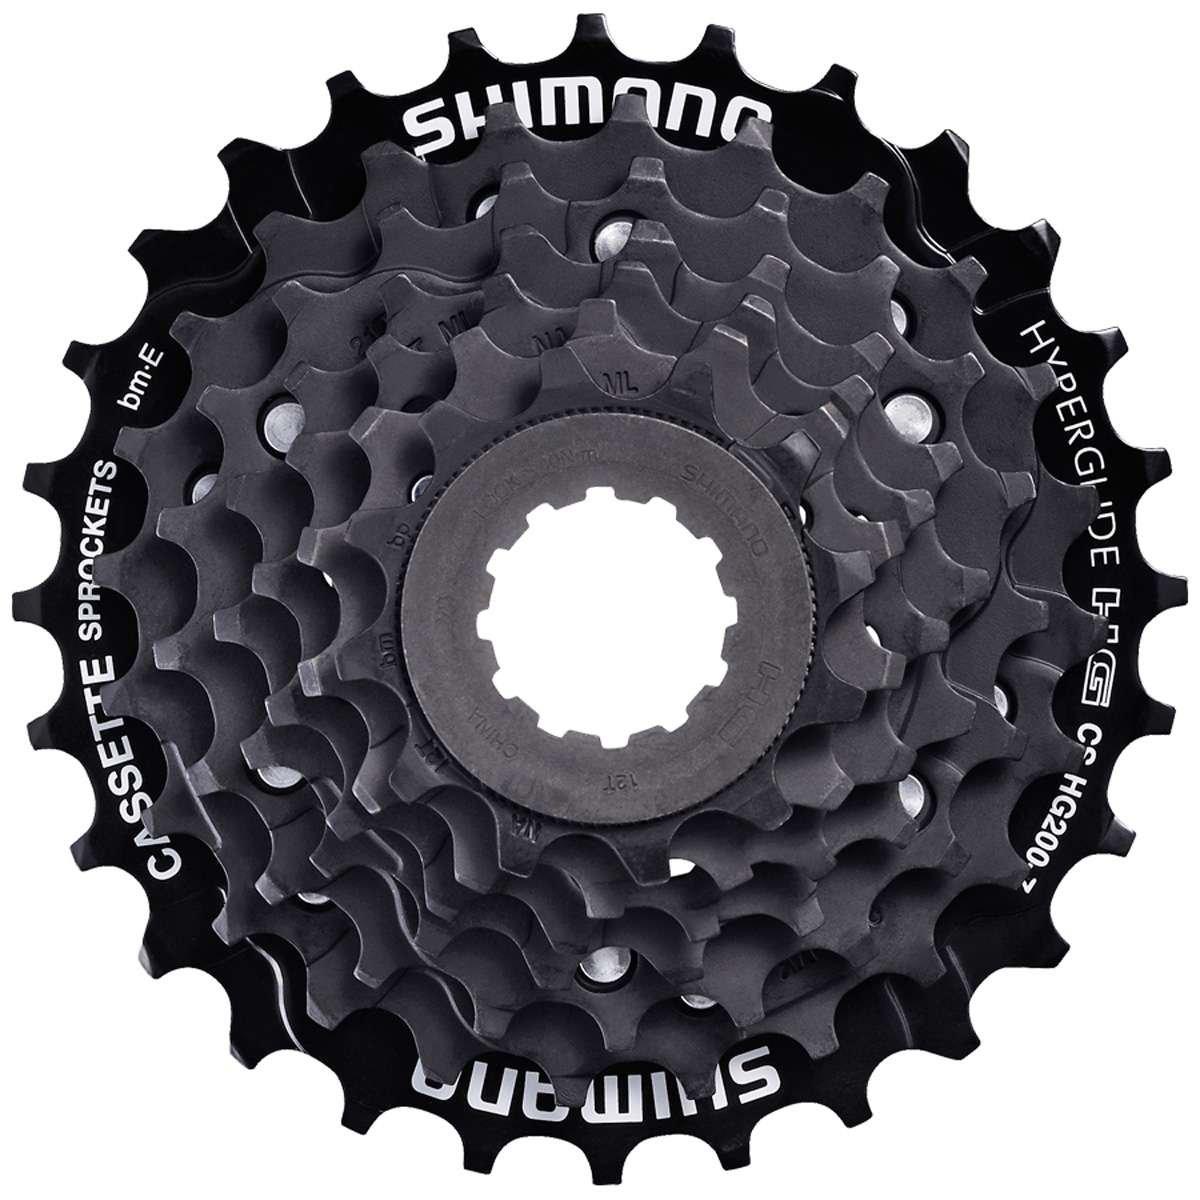 Shimano 7-Speed マウンテンバイクカセット - CS-HG200-7 12-32